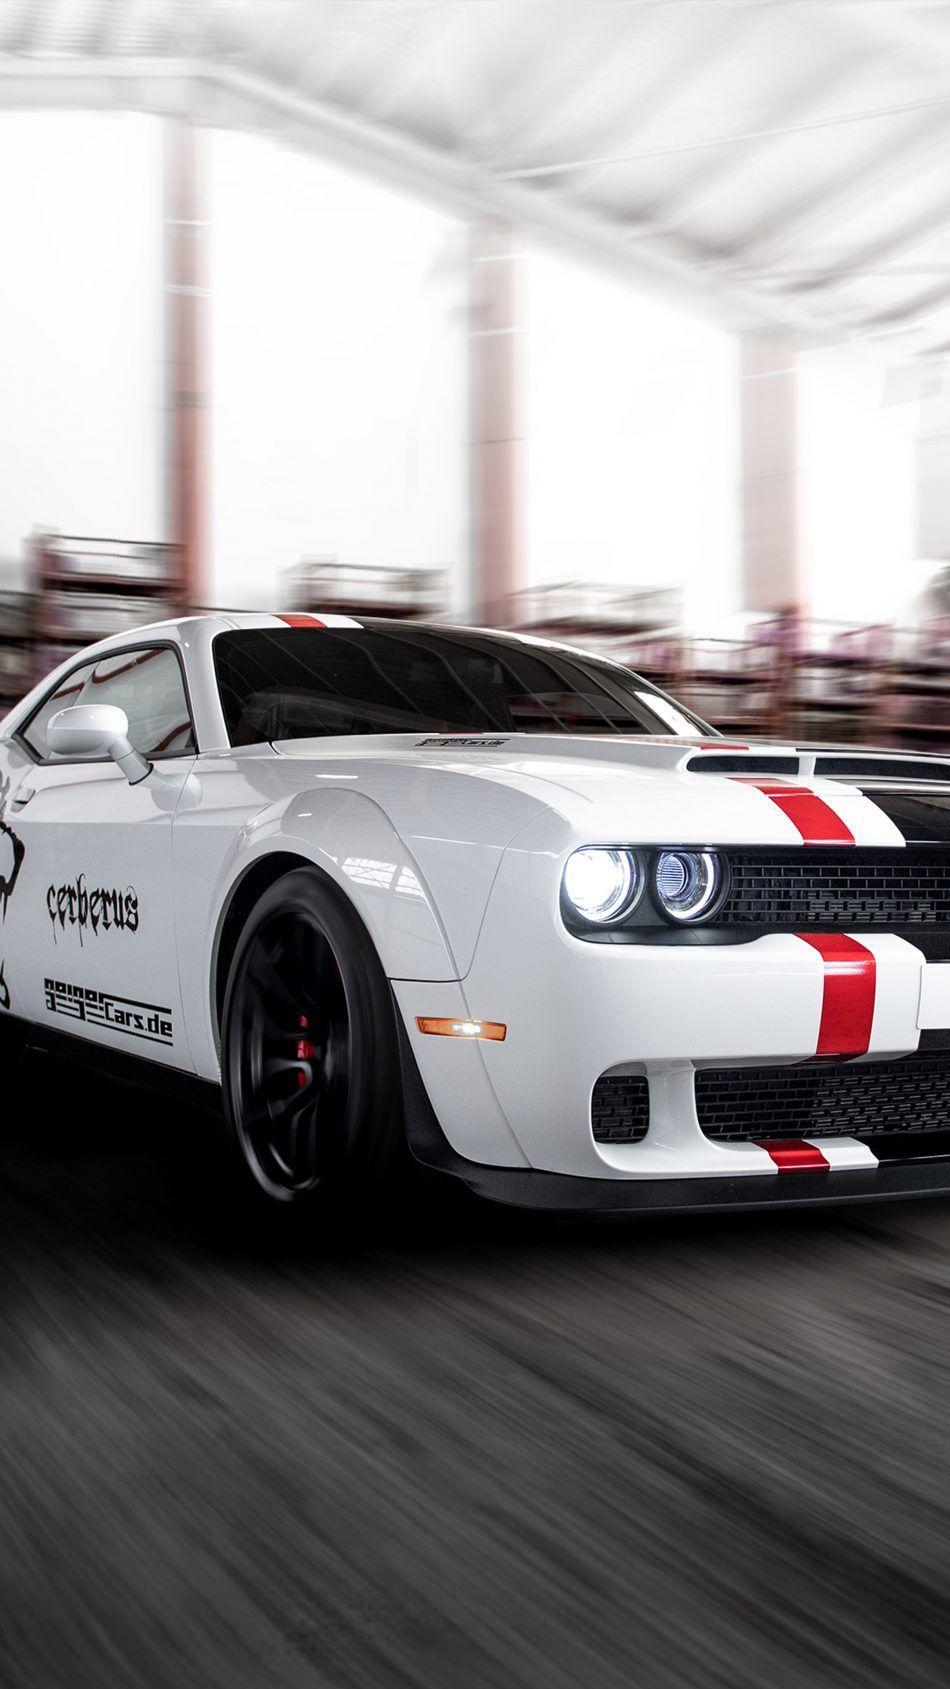 Dodge Hellcat Wallpapers Top Free Dodge Hellcat Backgrounds Wallpaperaccess